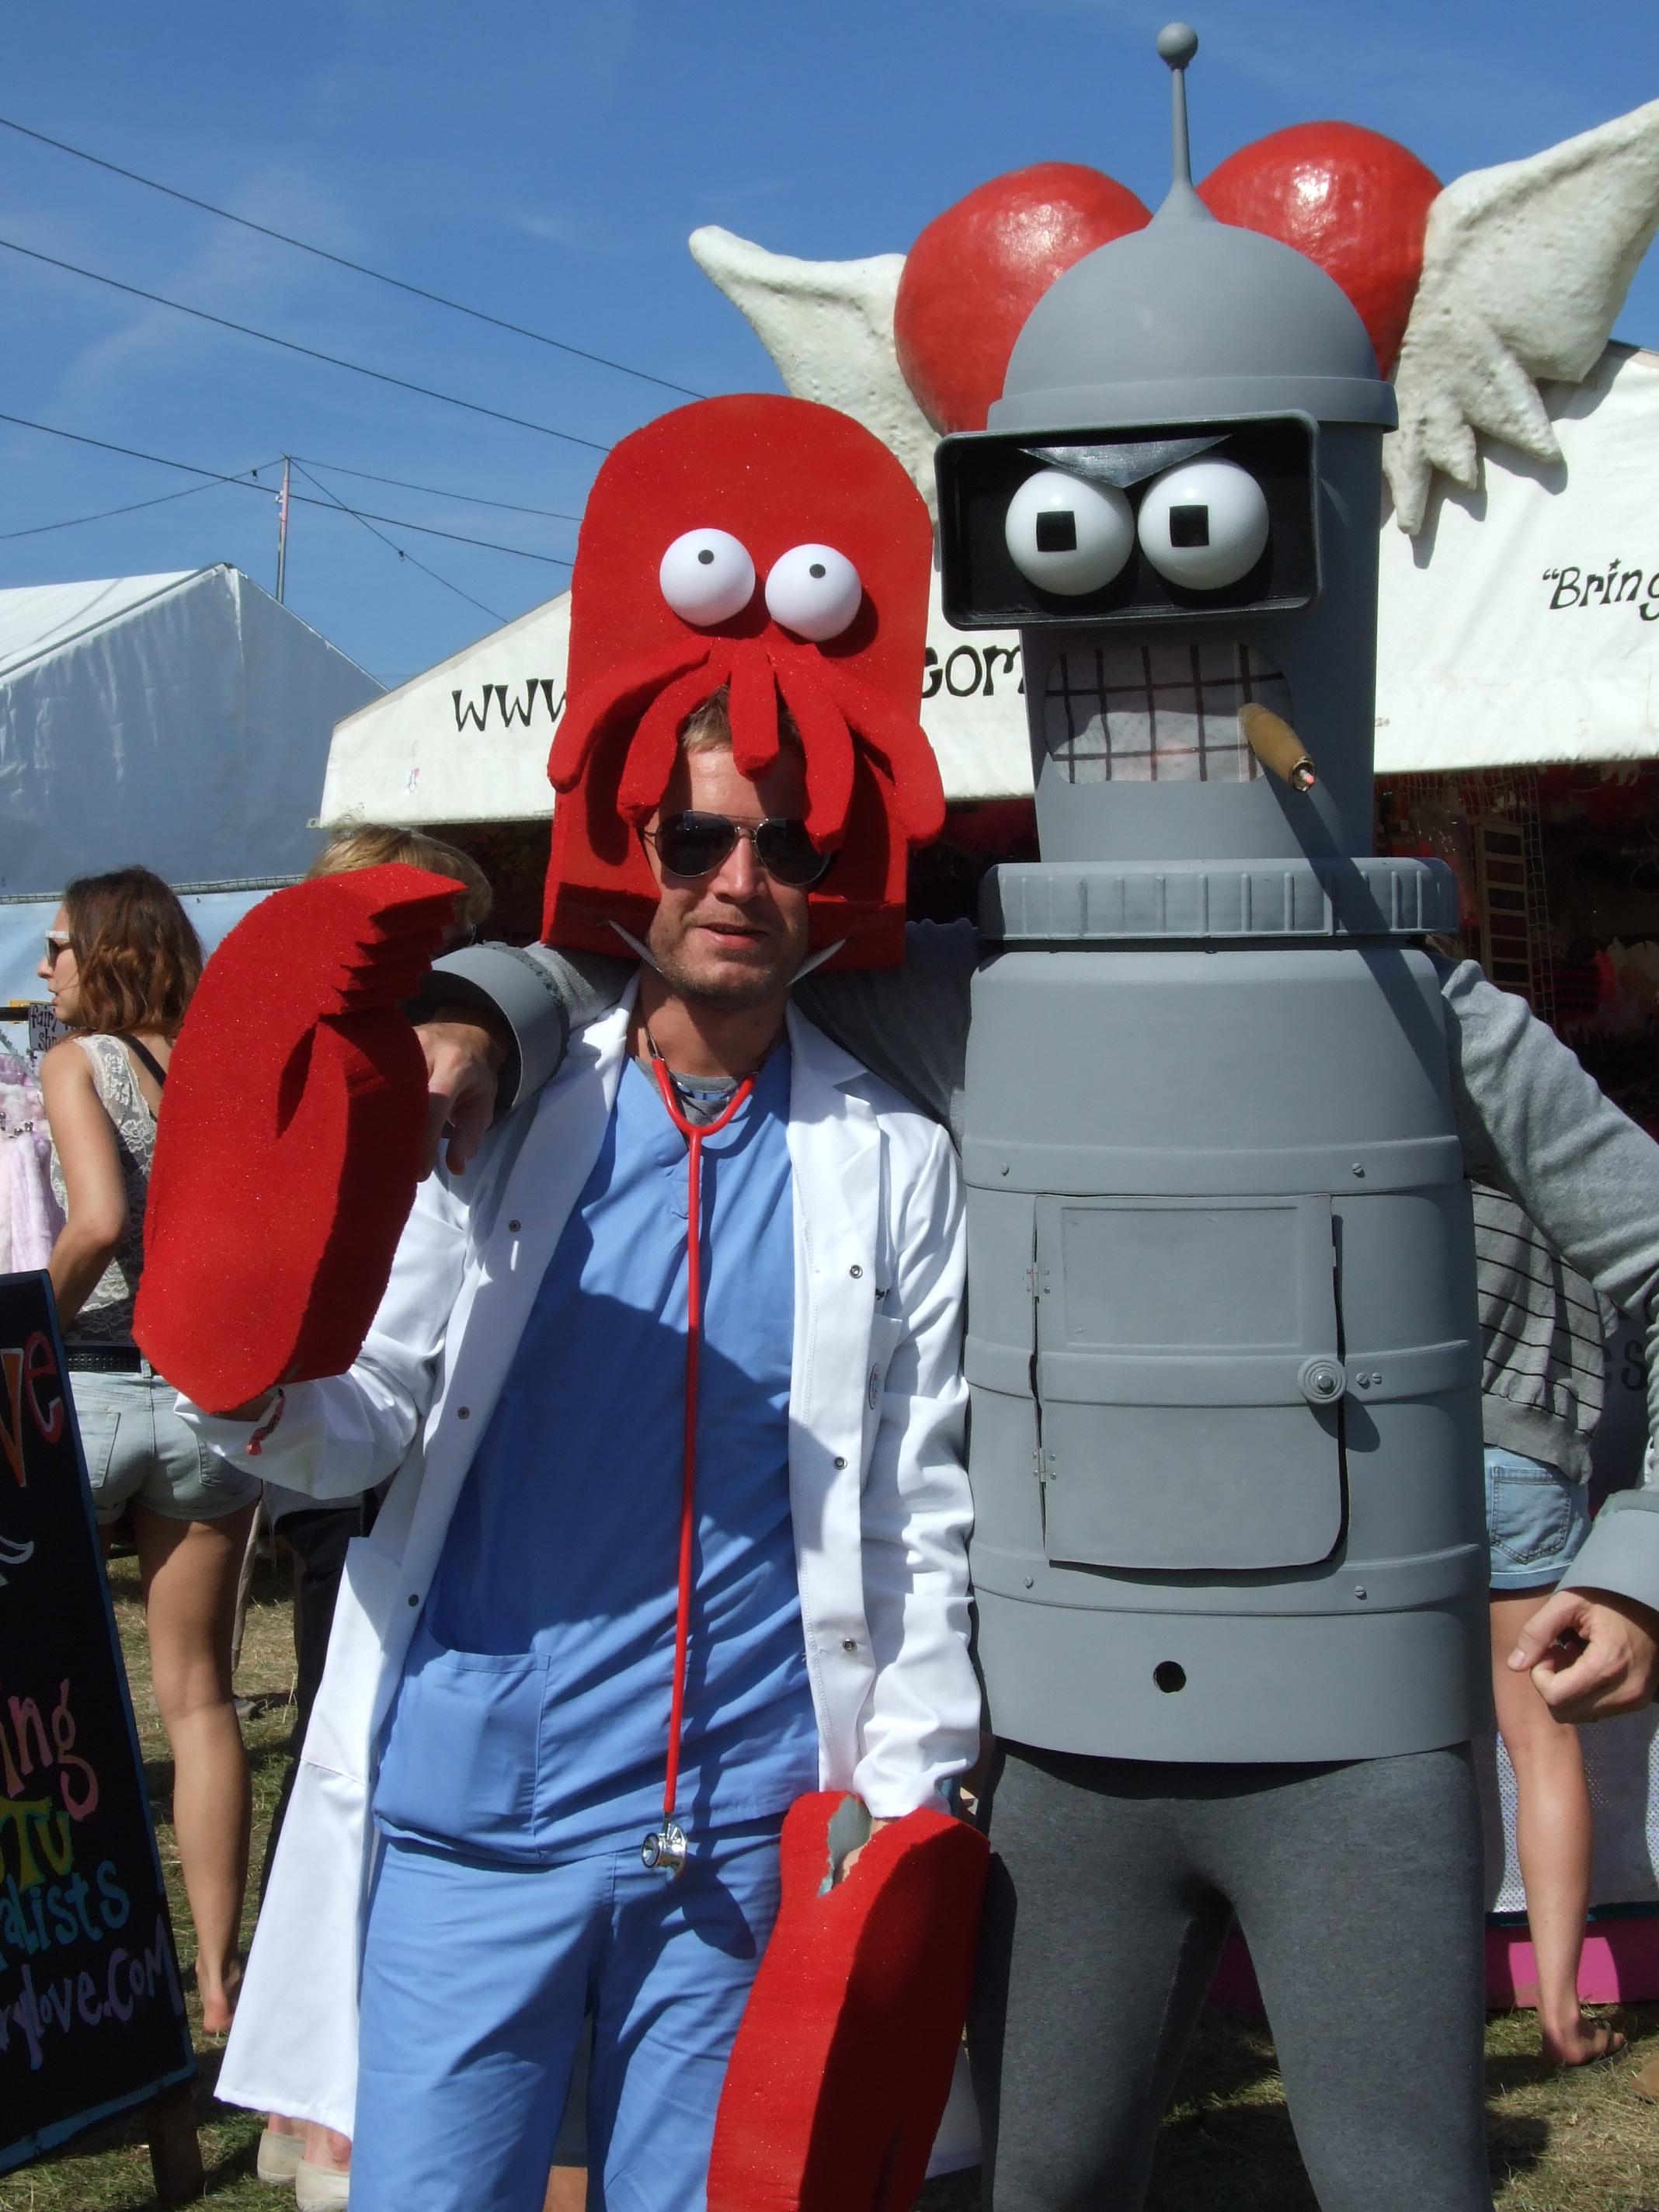 Zoidberg and Bender